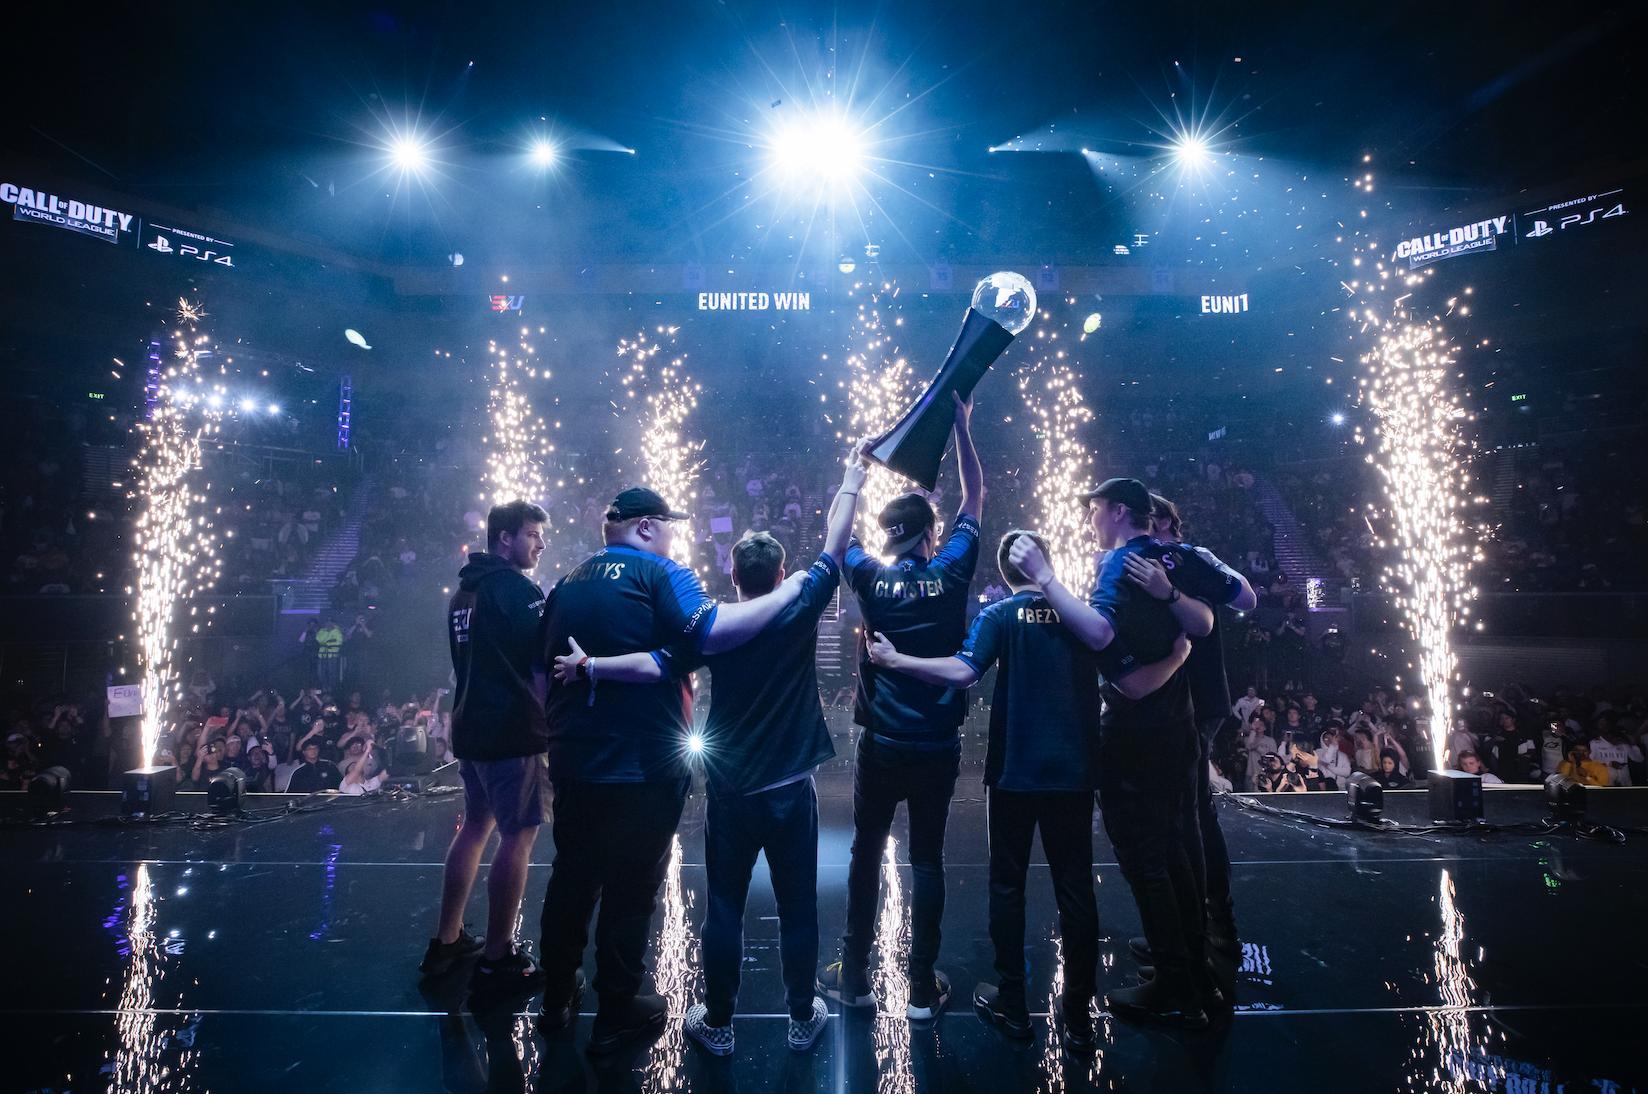 Call of Duty Championship 2019 eUnited raising trophy